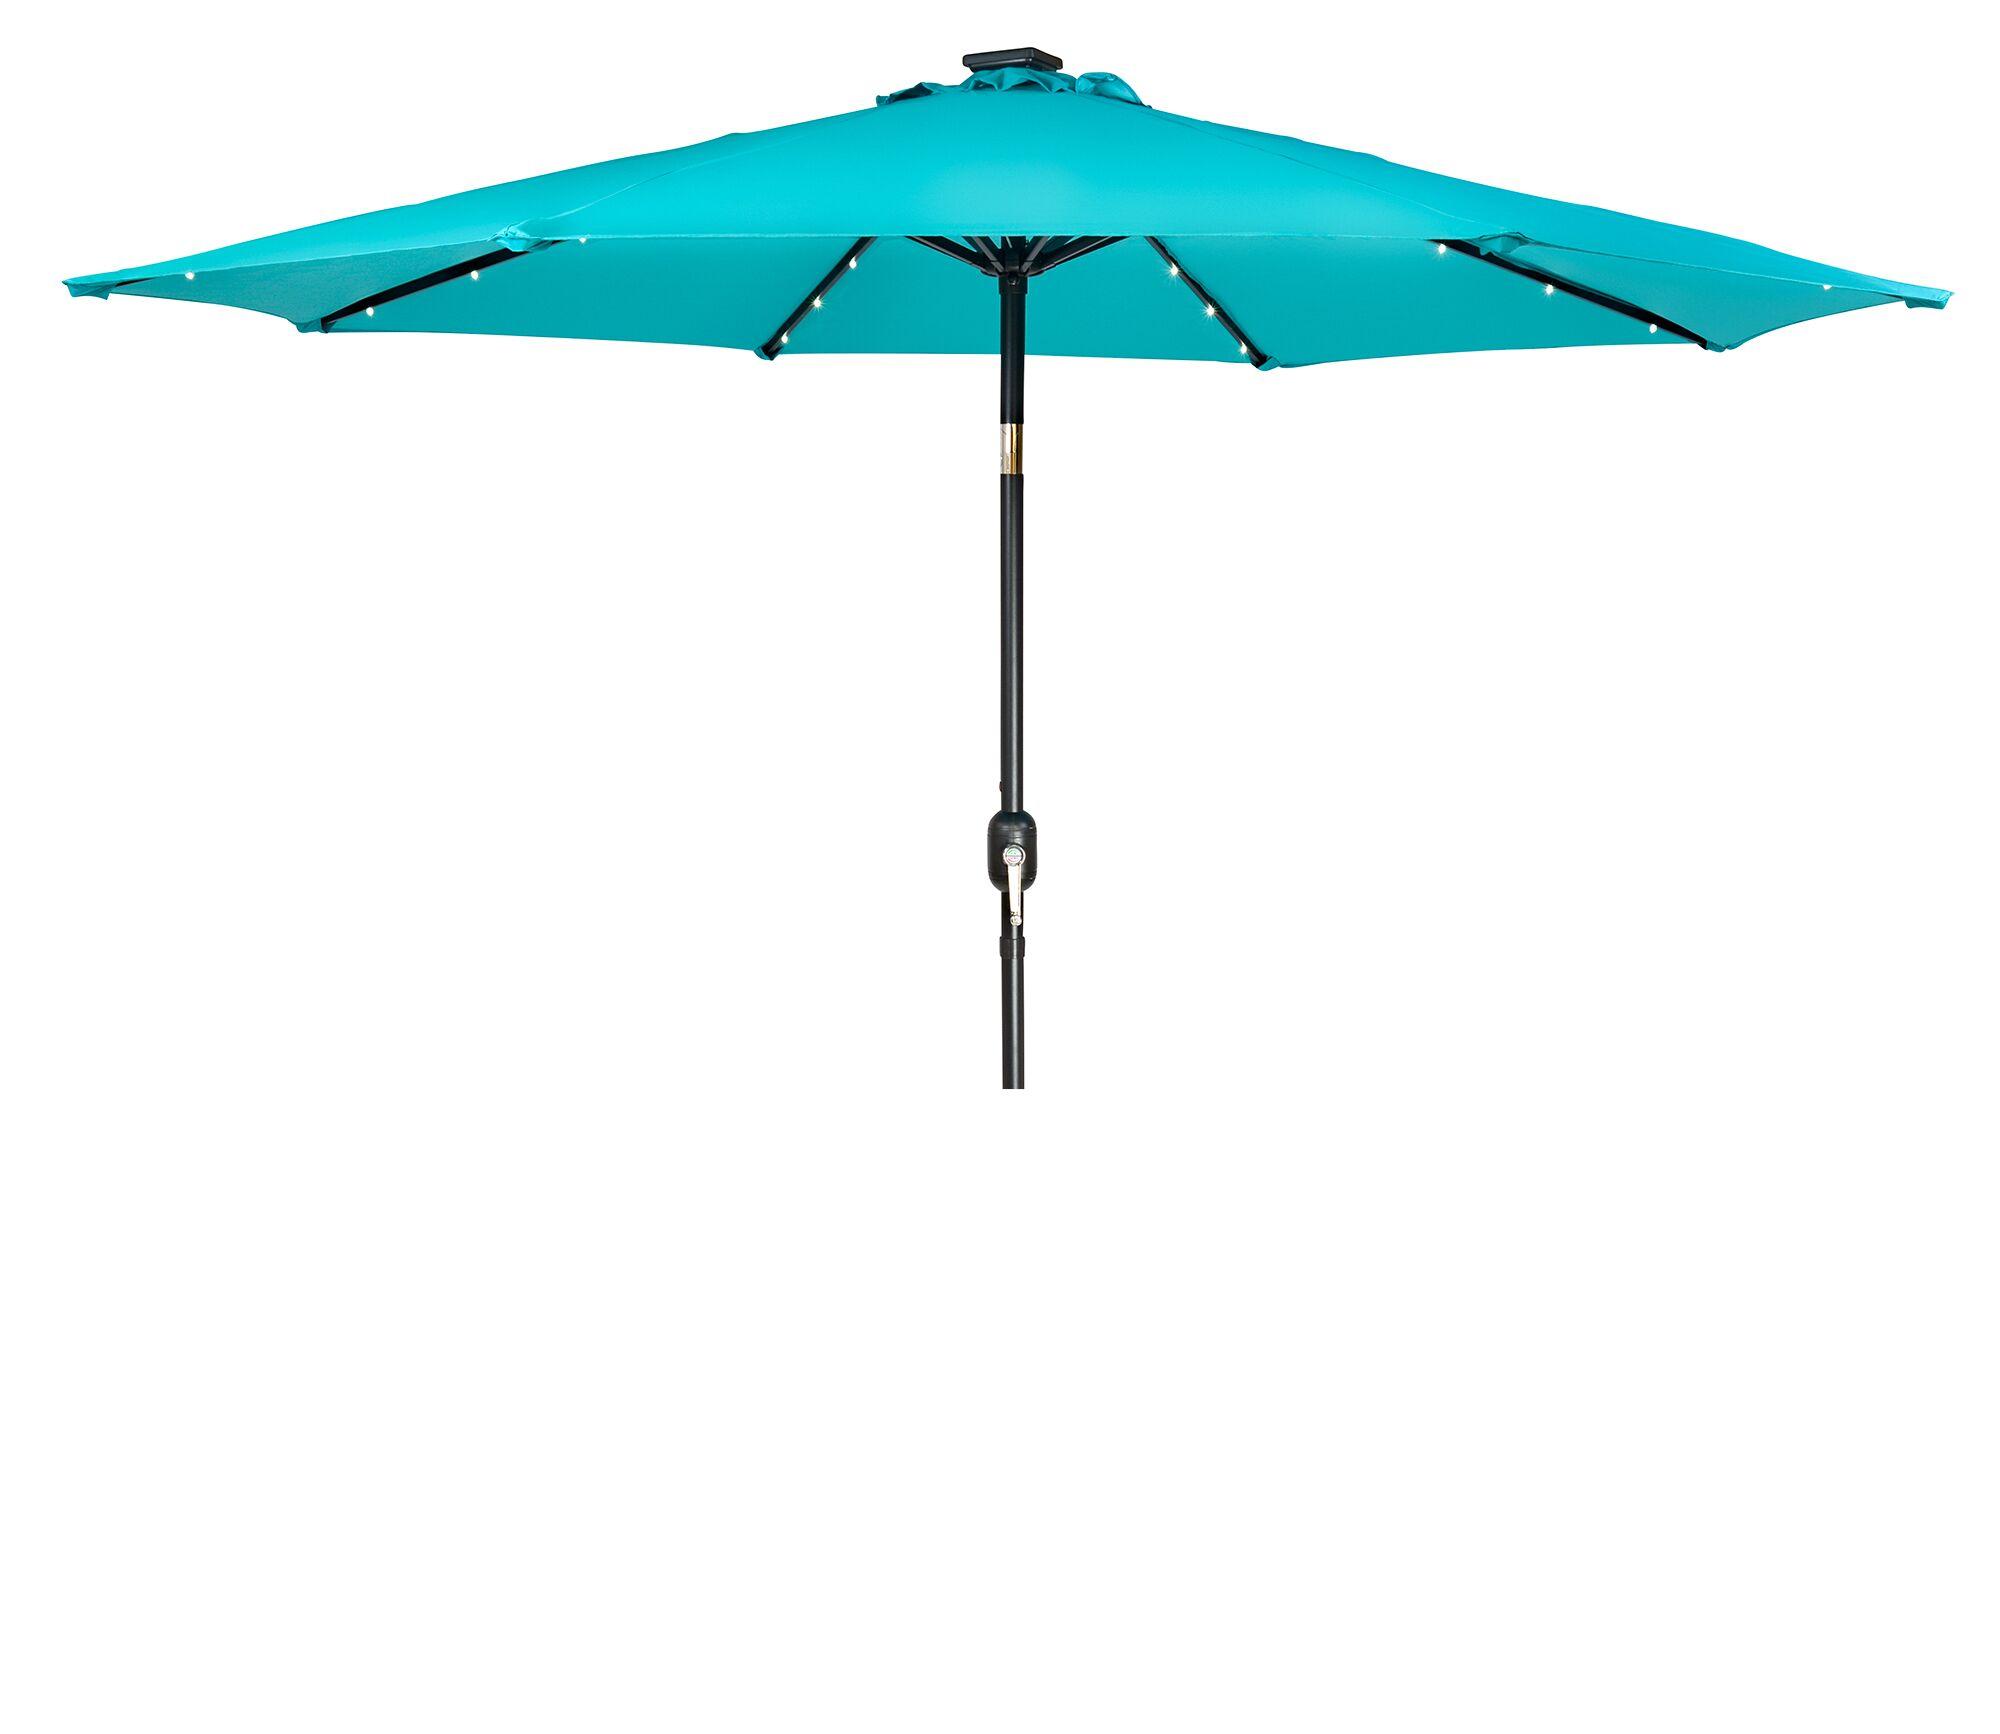 North Walsham 9' Lighted Umbrella Fabric: Pcock